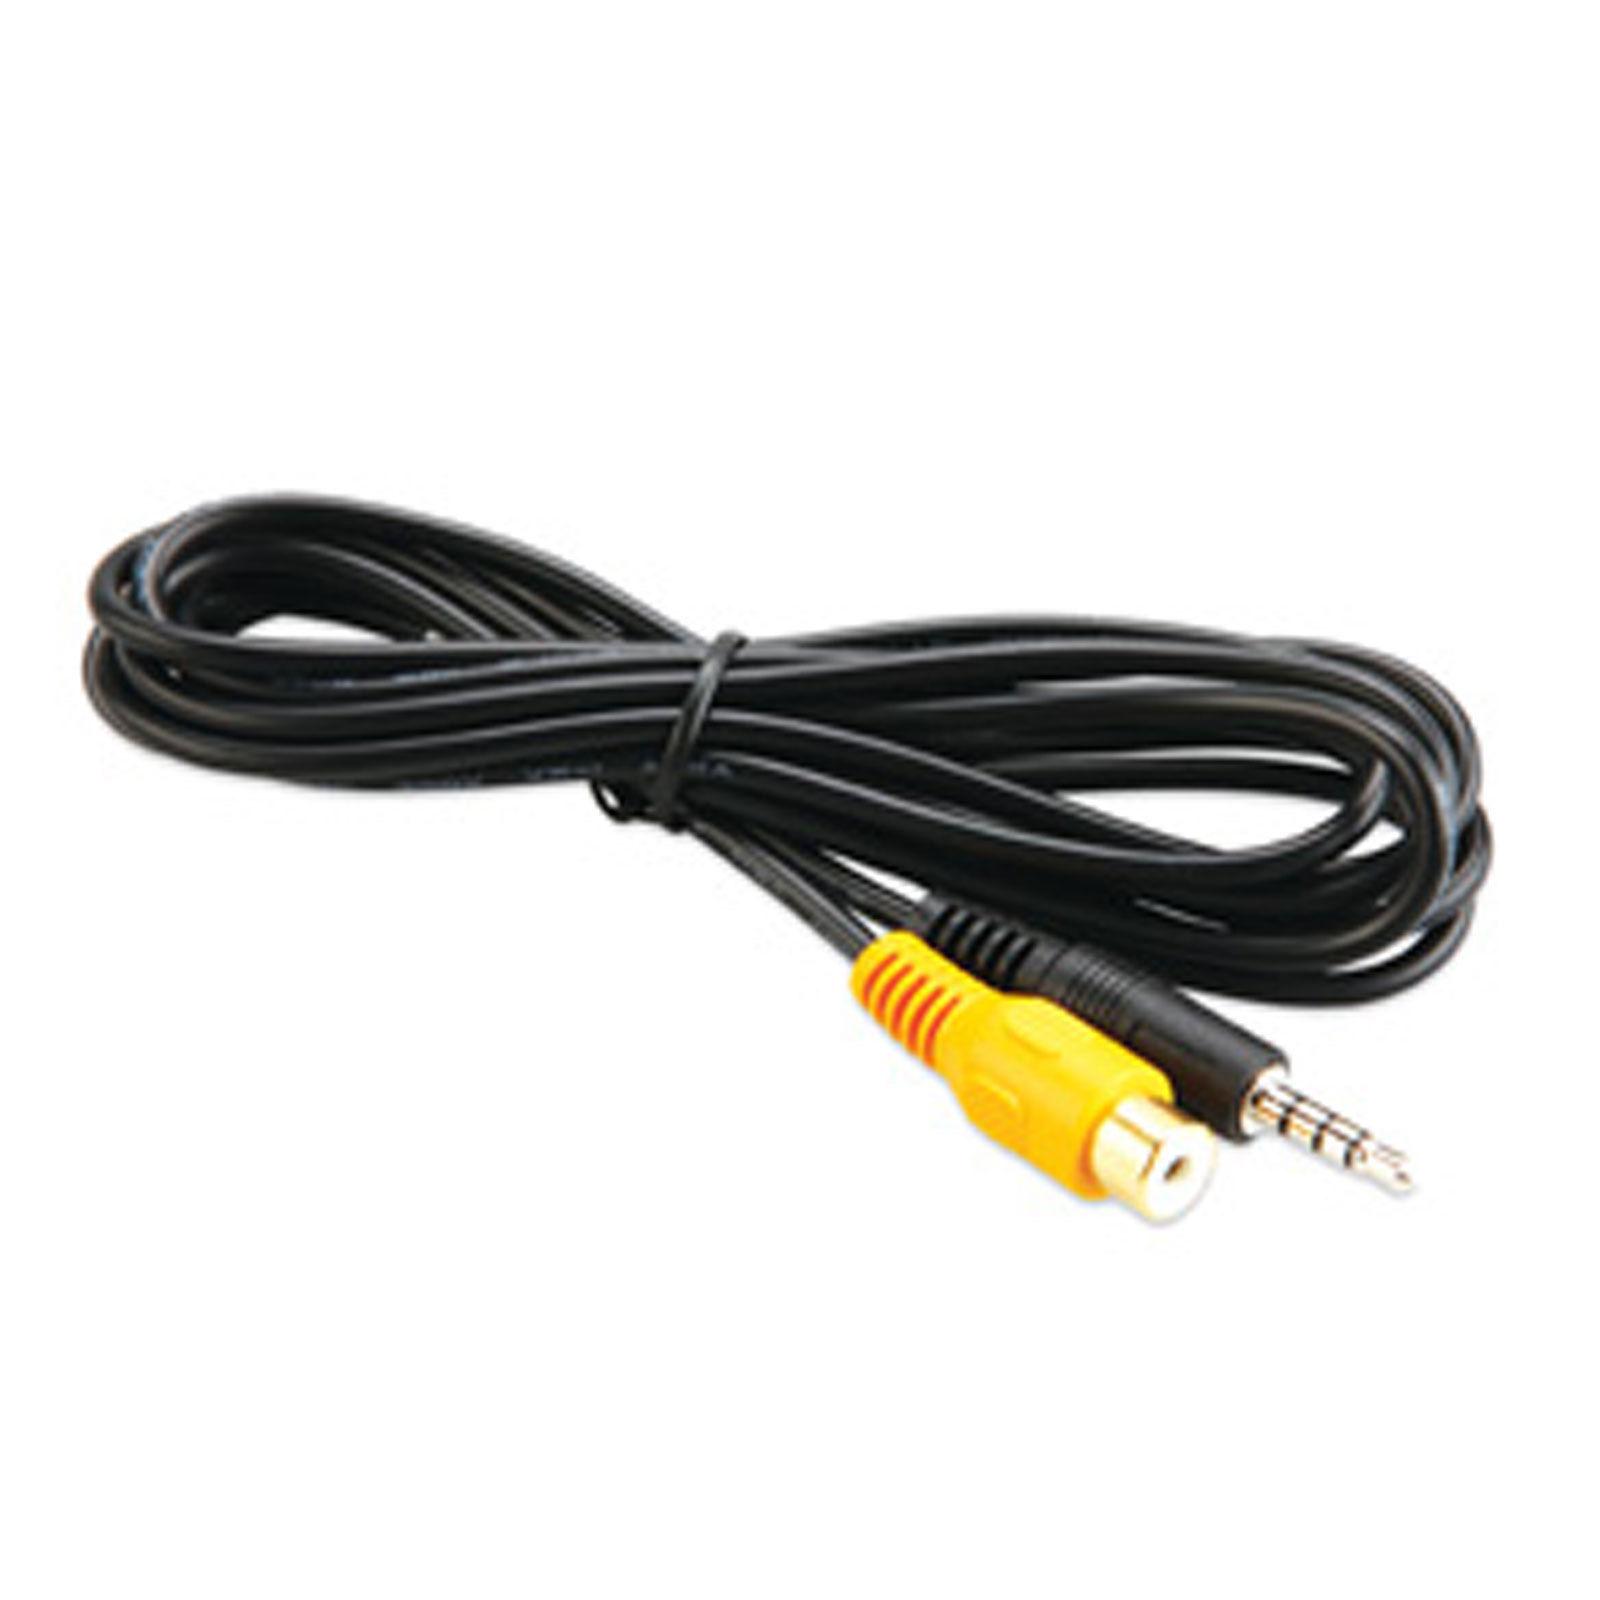 Garmin Video Input Cable / Lead | For Camper 760LMT-D_Dezl 770LMT-D/760LMT/560LMT GPS Navigator